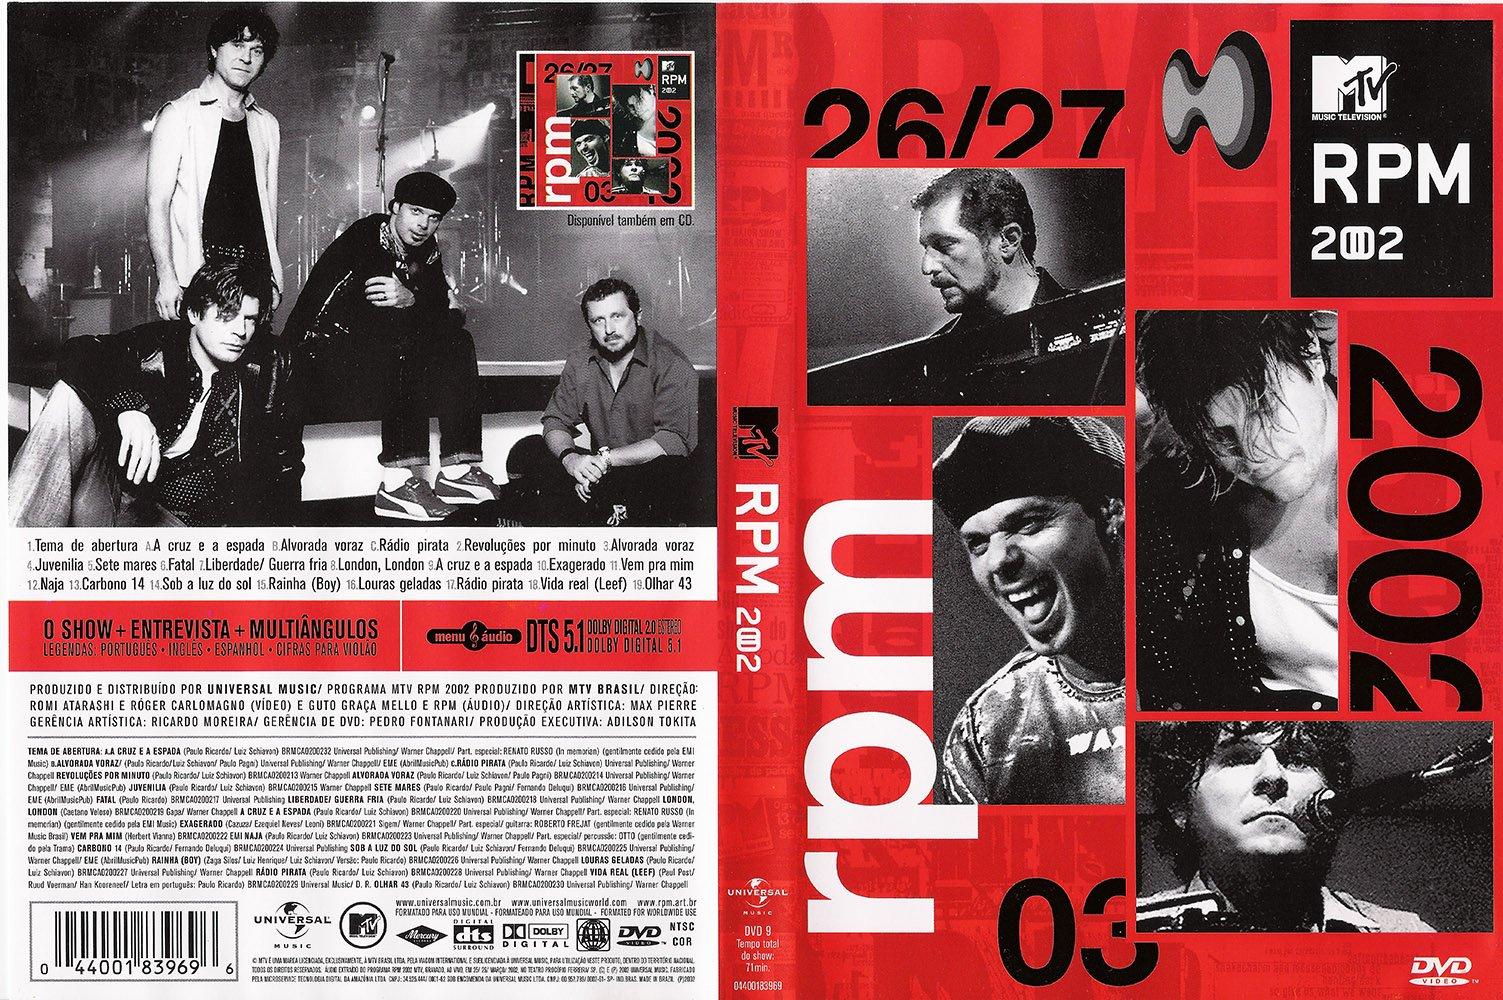 Download RPM MTV Ao Vivo DVD-R RPM  XANDAO DOWNLOAD